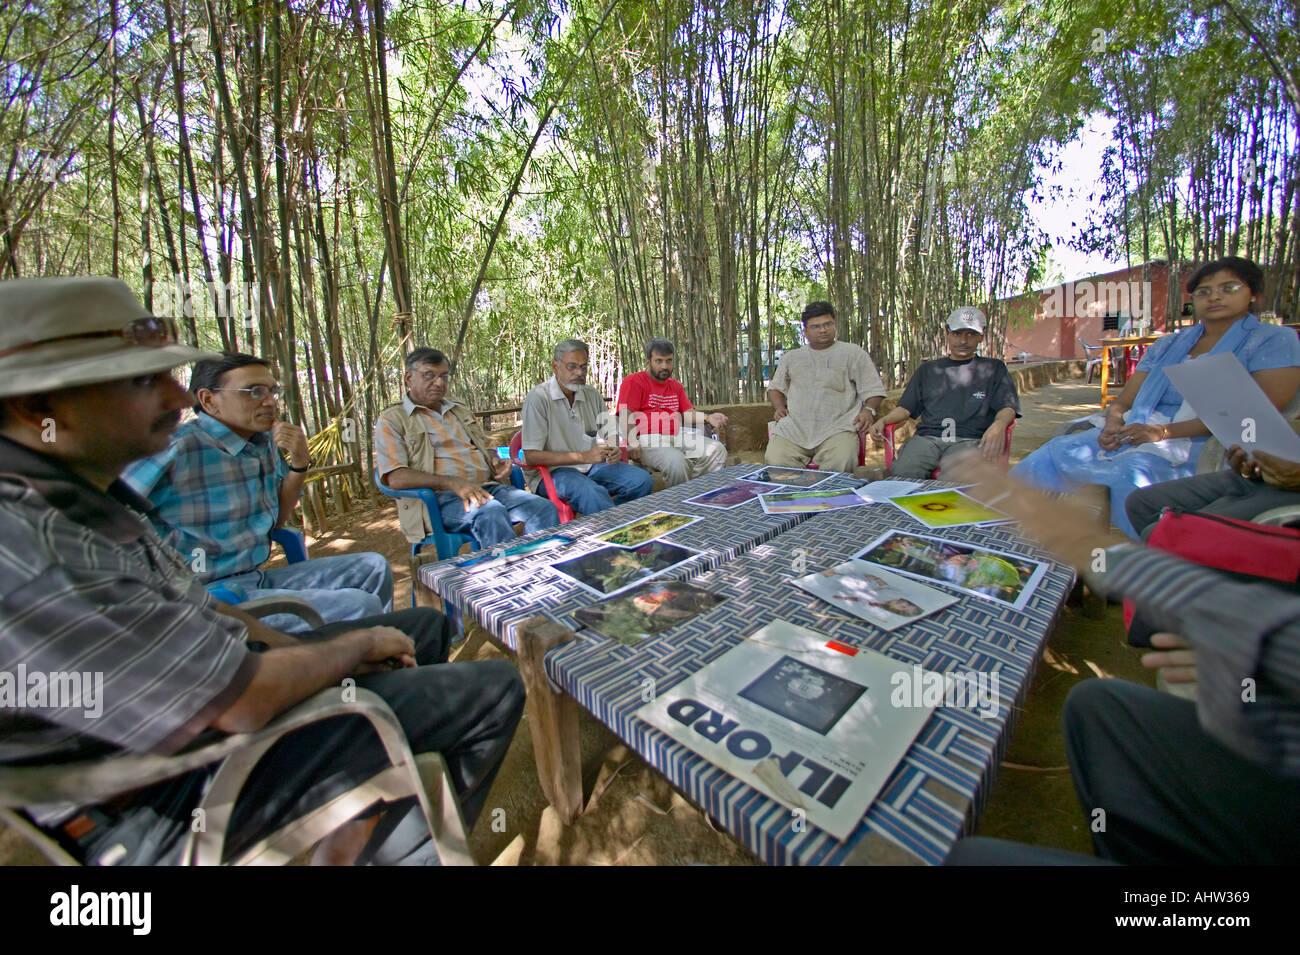 AAD 91600 taller creativo de fotografía fotógrafos Dinodia discutiendo arte Neral Maharashtra INDIA Foto de stock